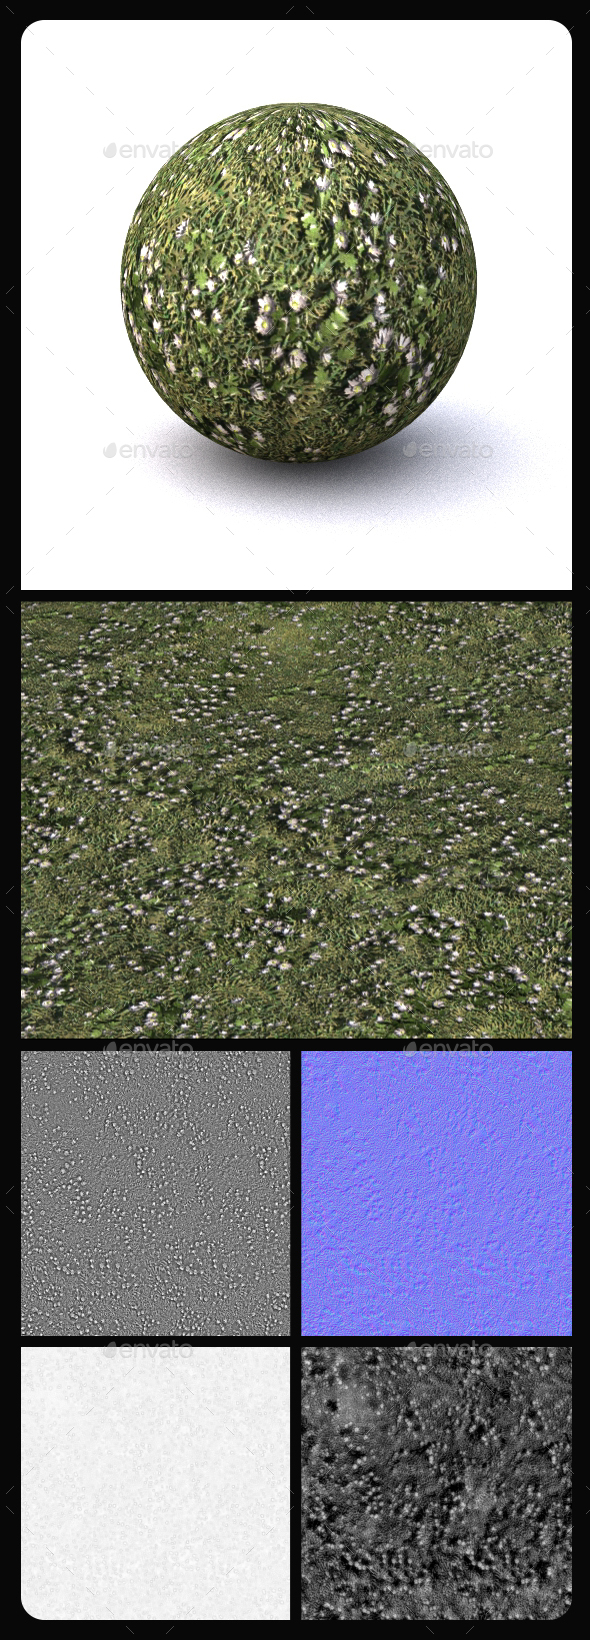 Grass Tile Texture 2 - 3DOcean Item for Sale